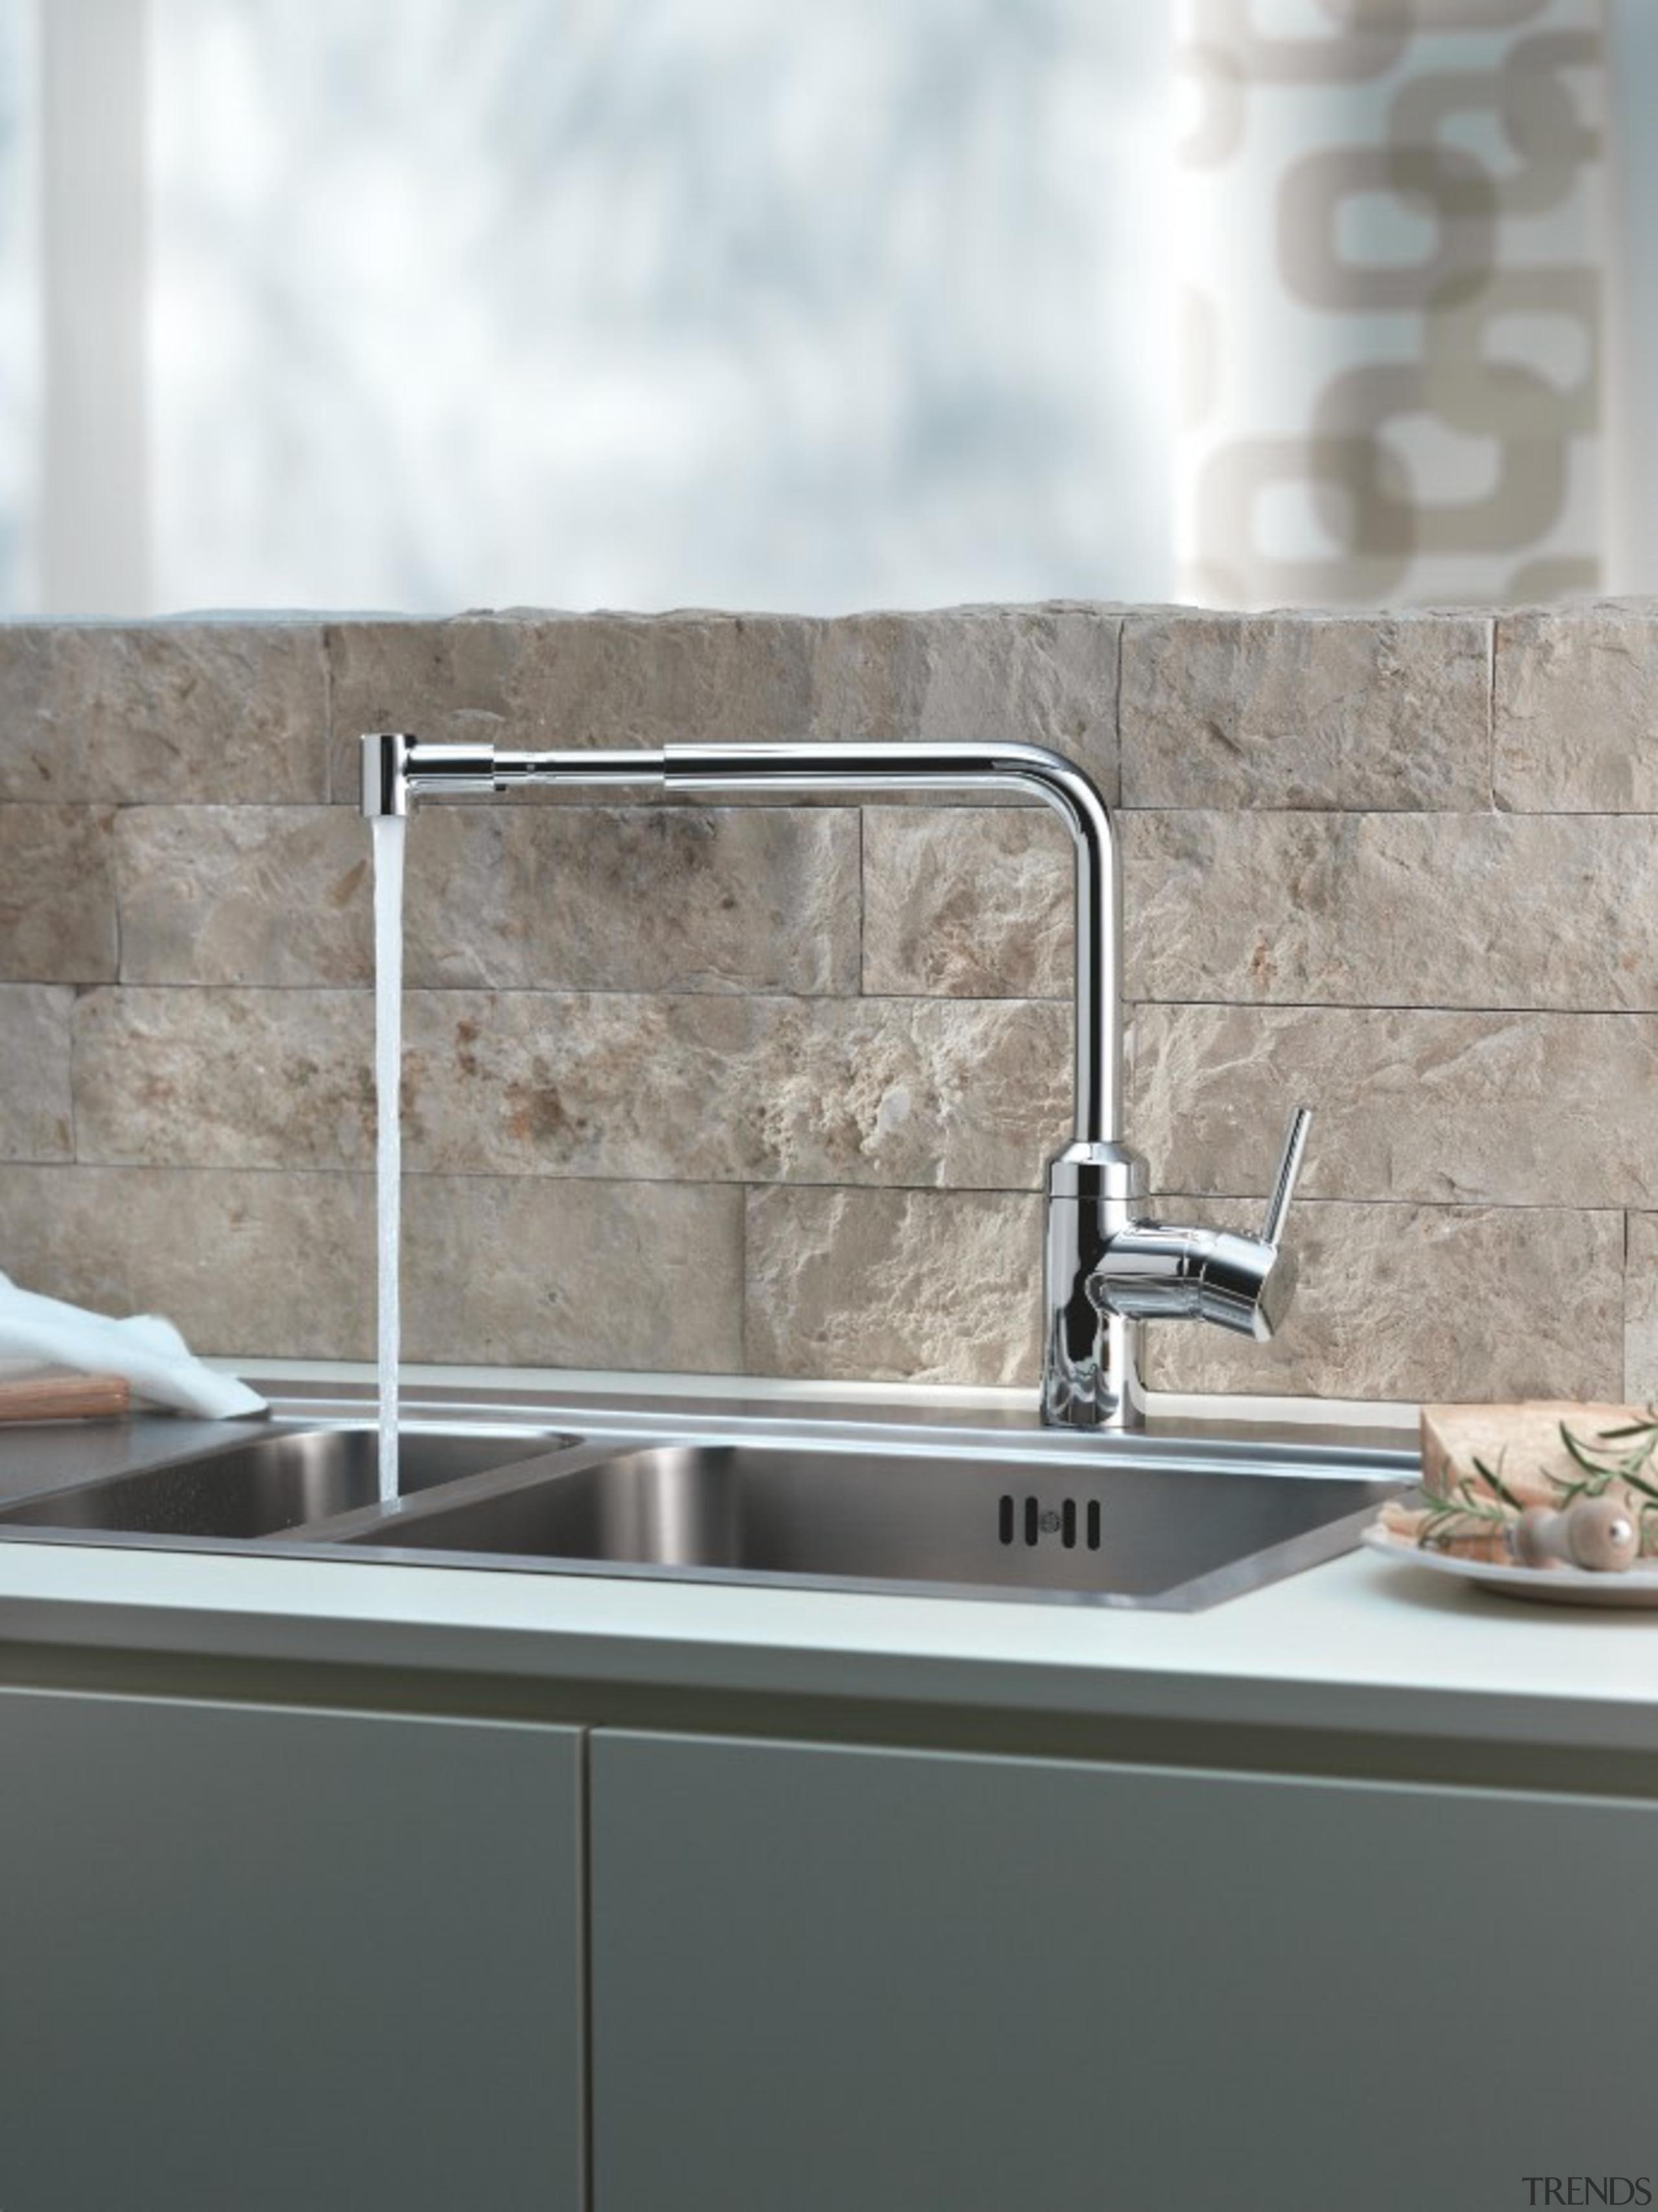 The L-INE Sink Mixer range from Kludi is countertop, kitchen, plumbing fixture, sink, tap, tile, gray, white